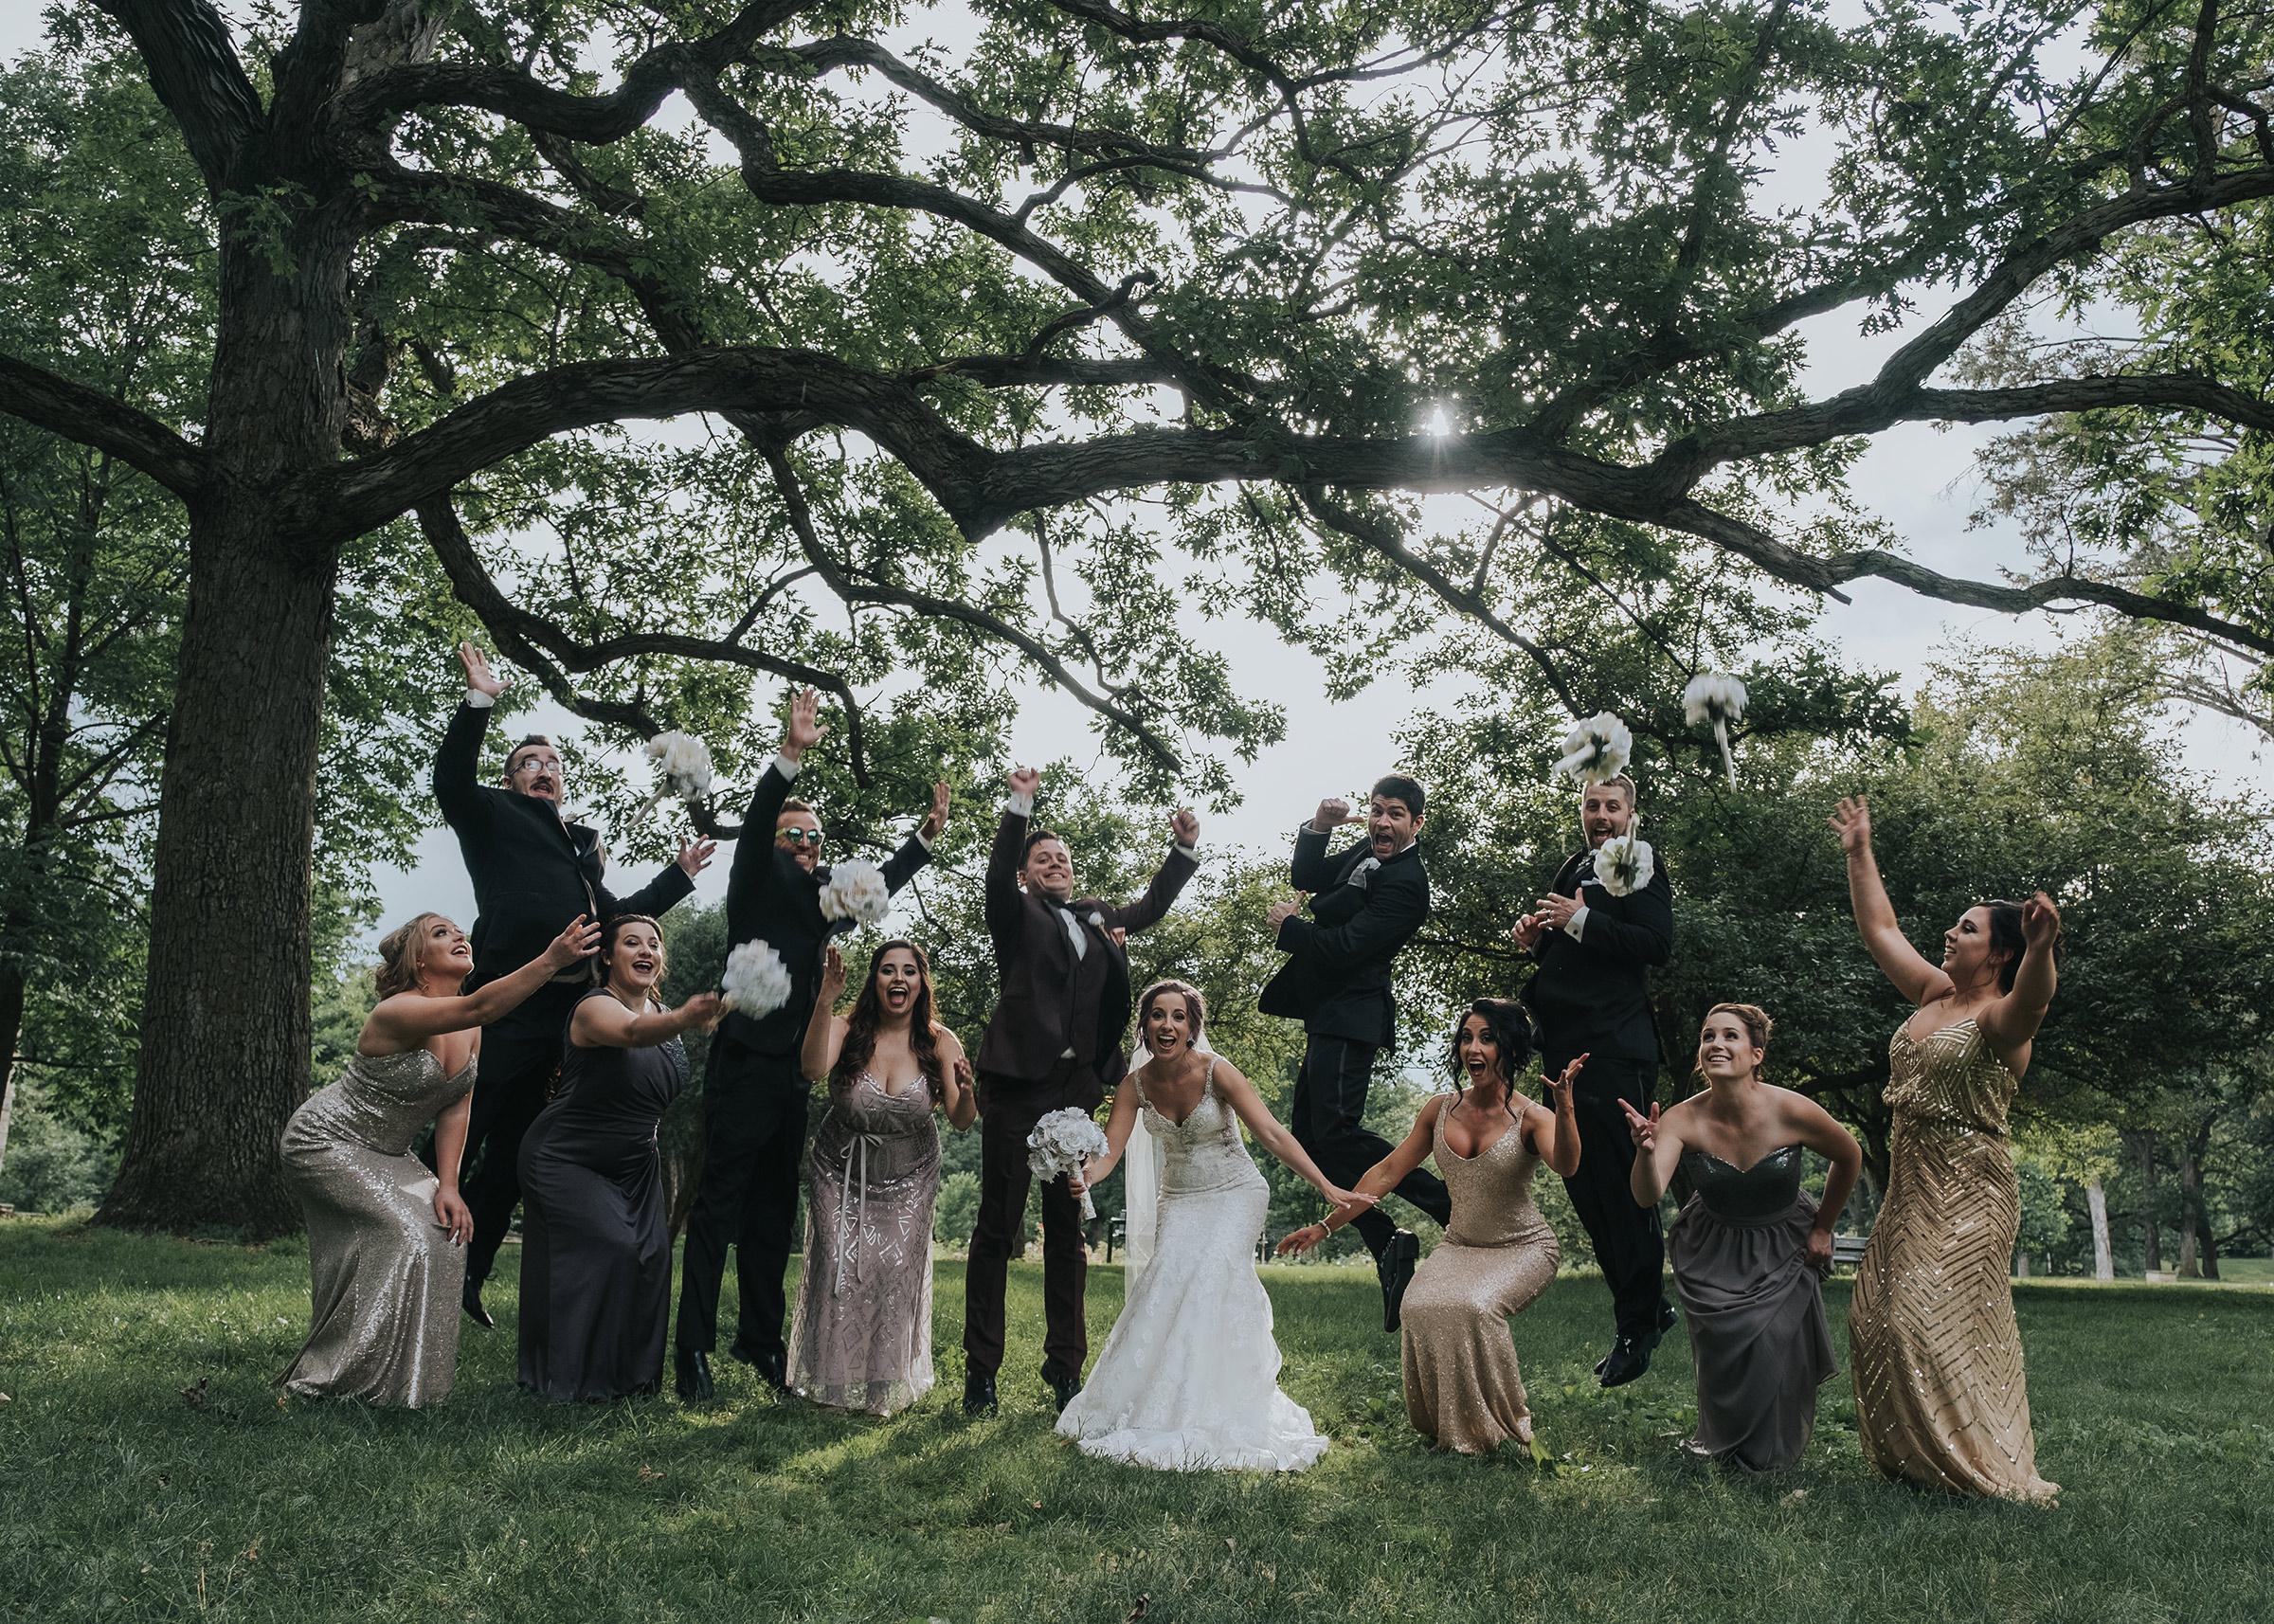 wedding-party-jumping-desmoines-iowa-art-center-raelyn-ramey-photography.jpg